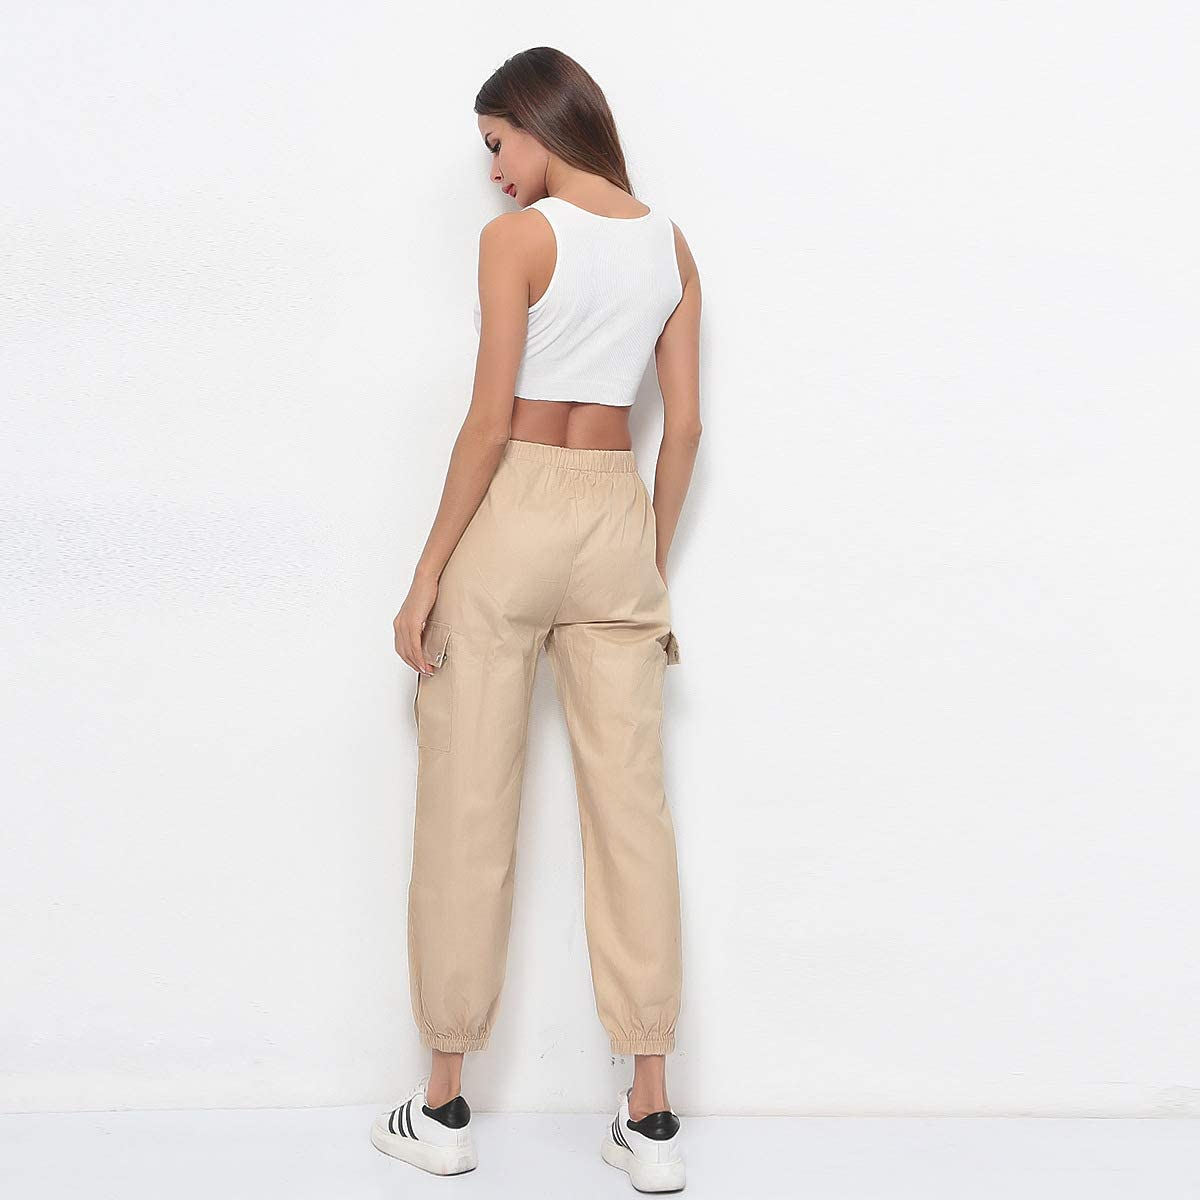 Pantaloni Donna Pantaloni Cargo con Tasche Harem Hip Hop Pantalone Casual Lunghi Pants Punk Rock